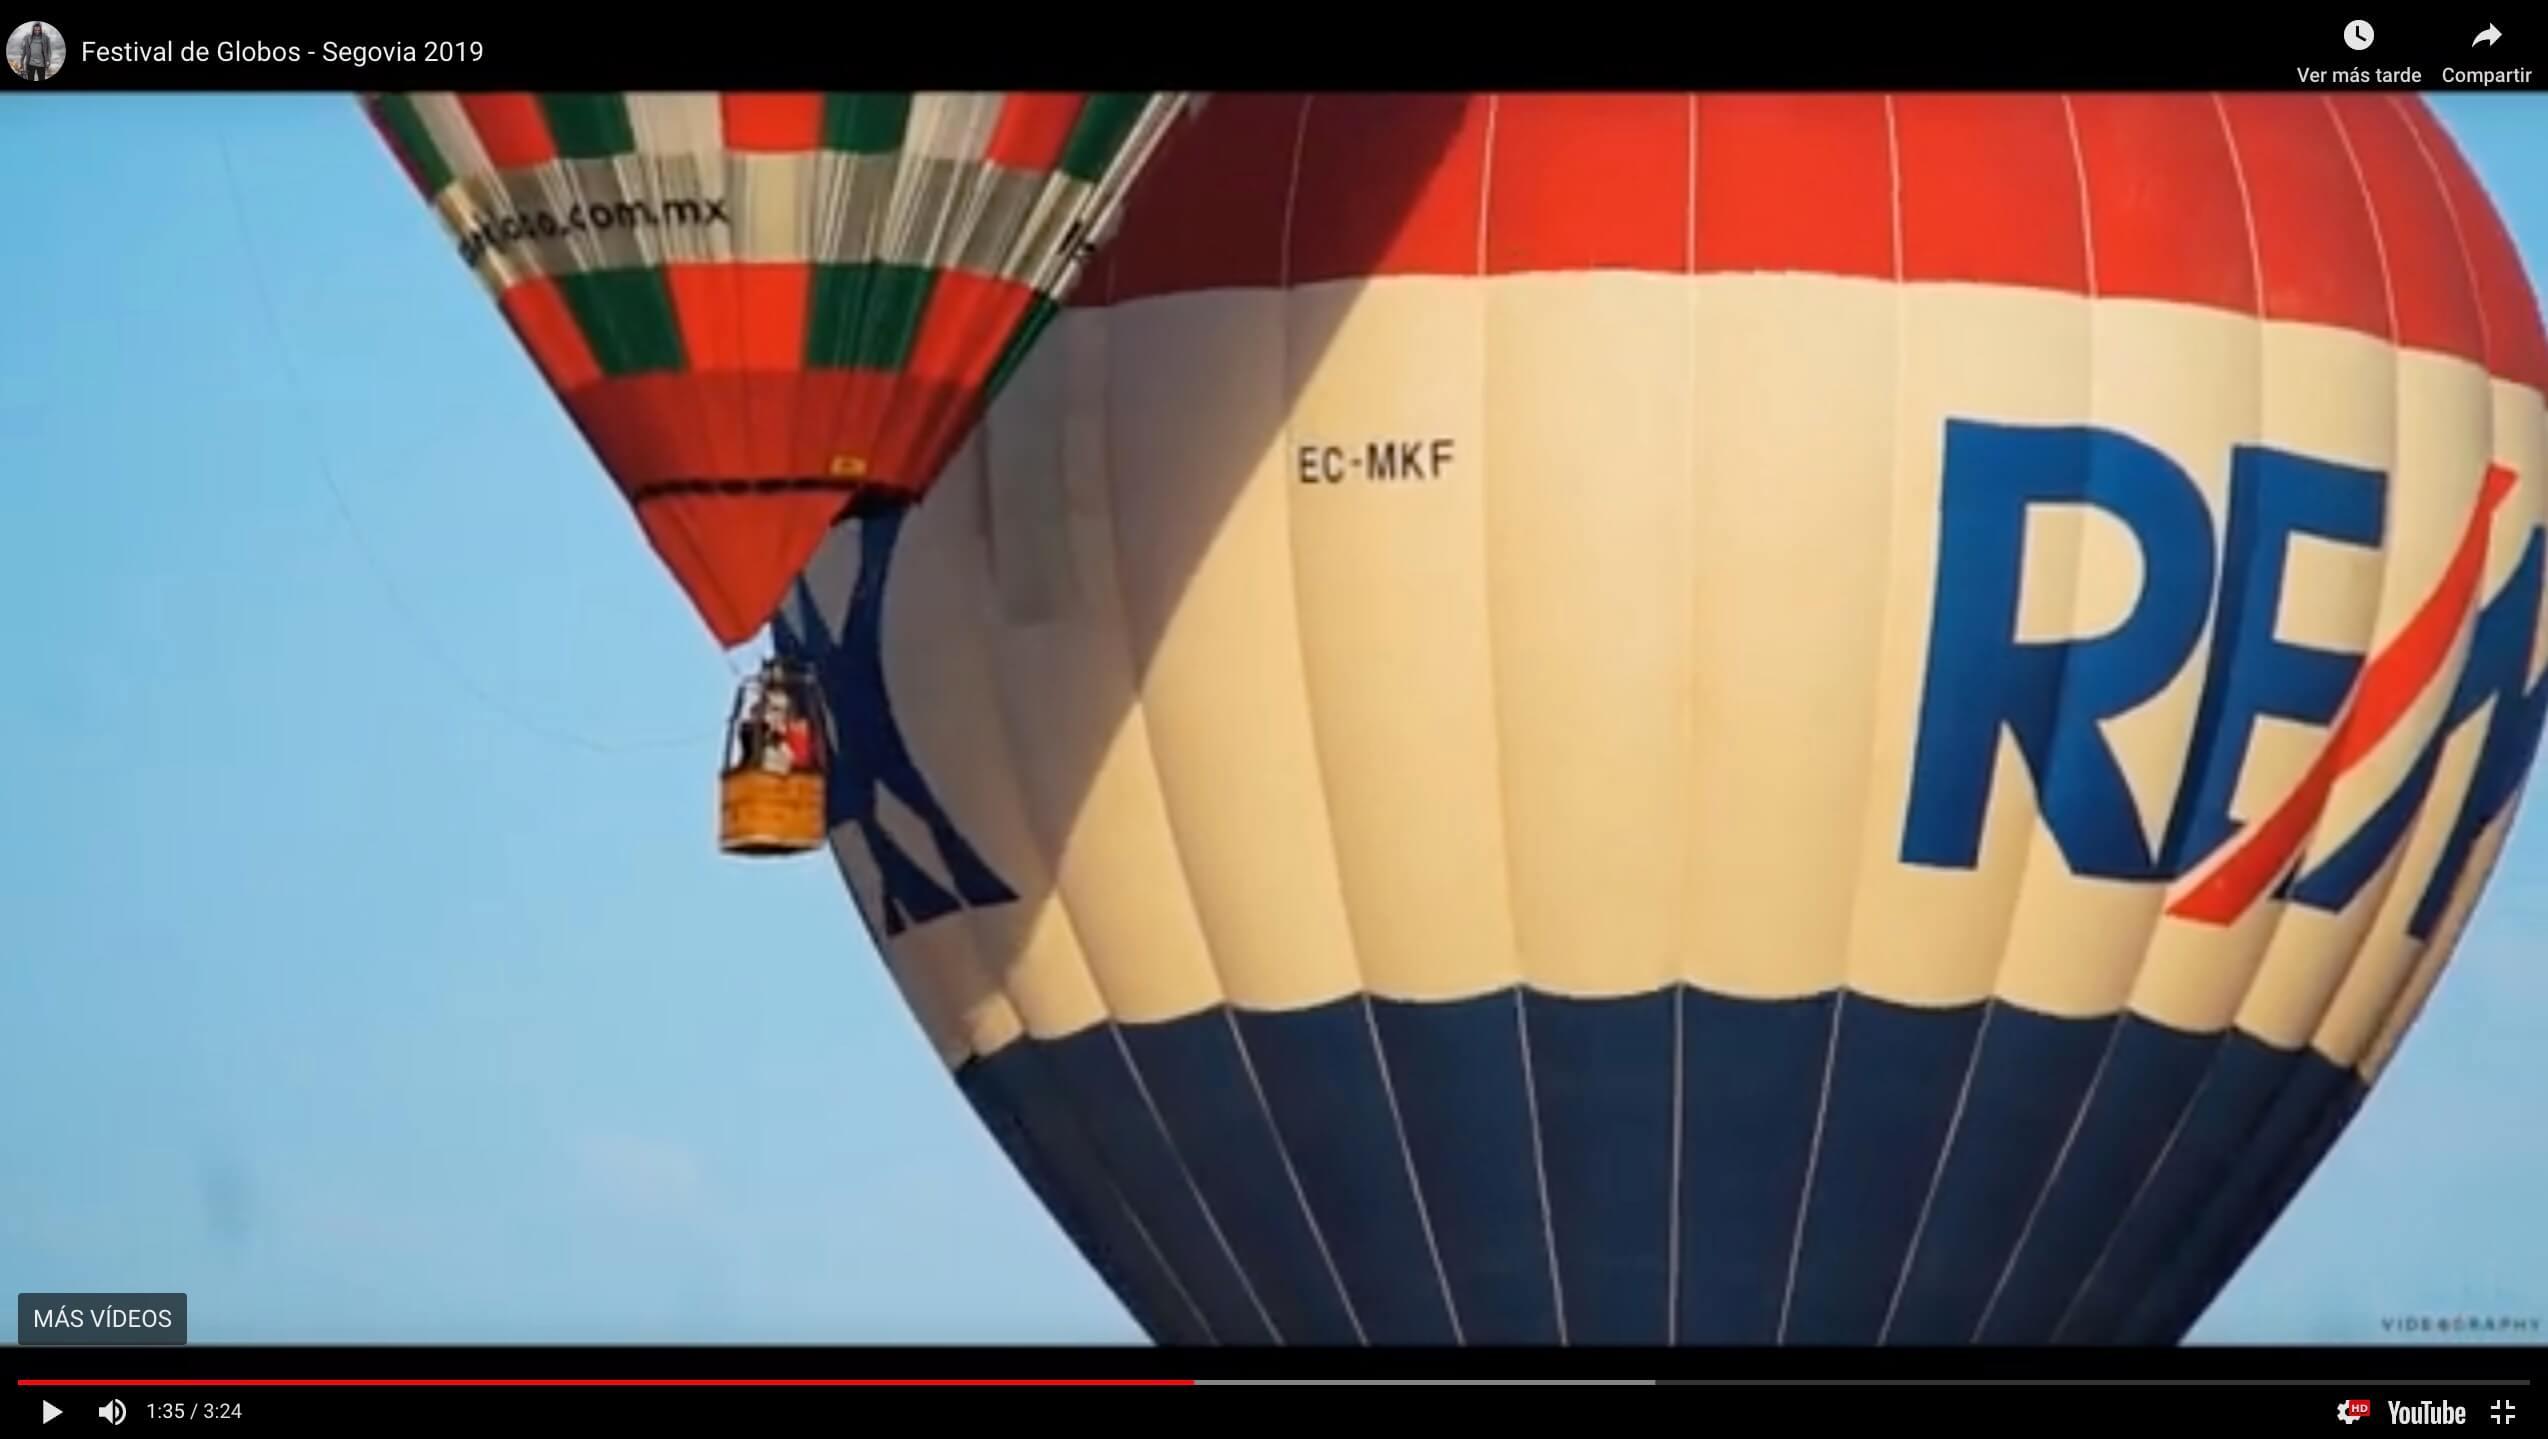 Segovia se llena de globos